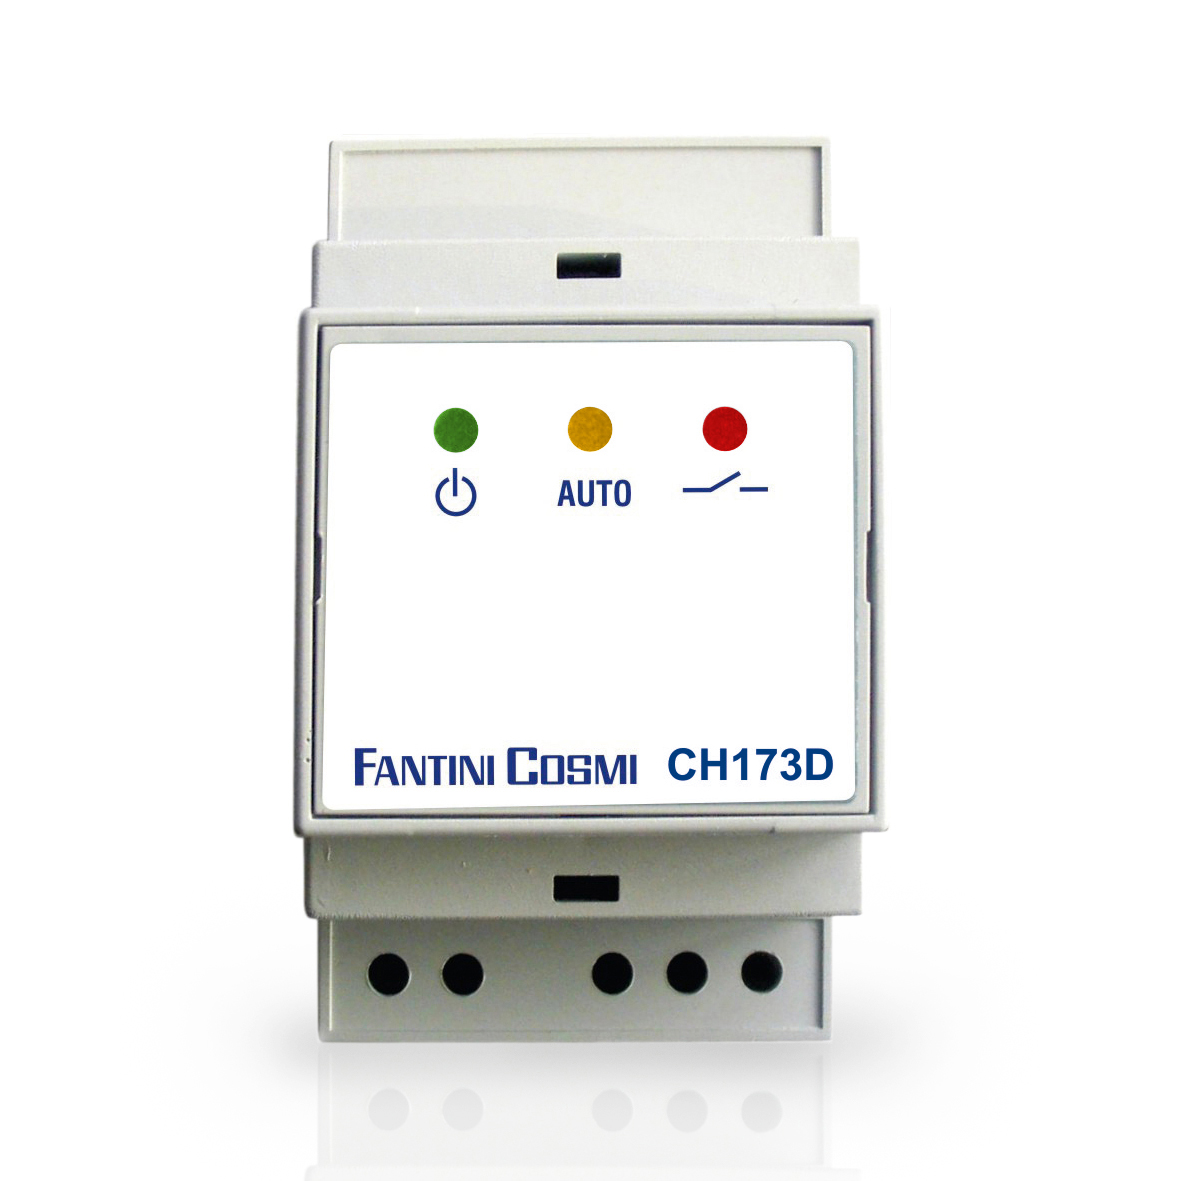 FANTINI COSMI CH173D Ricevitore a onde radio per termostati a radiofrequenza